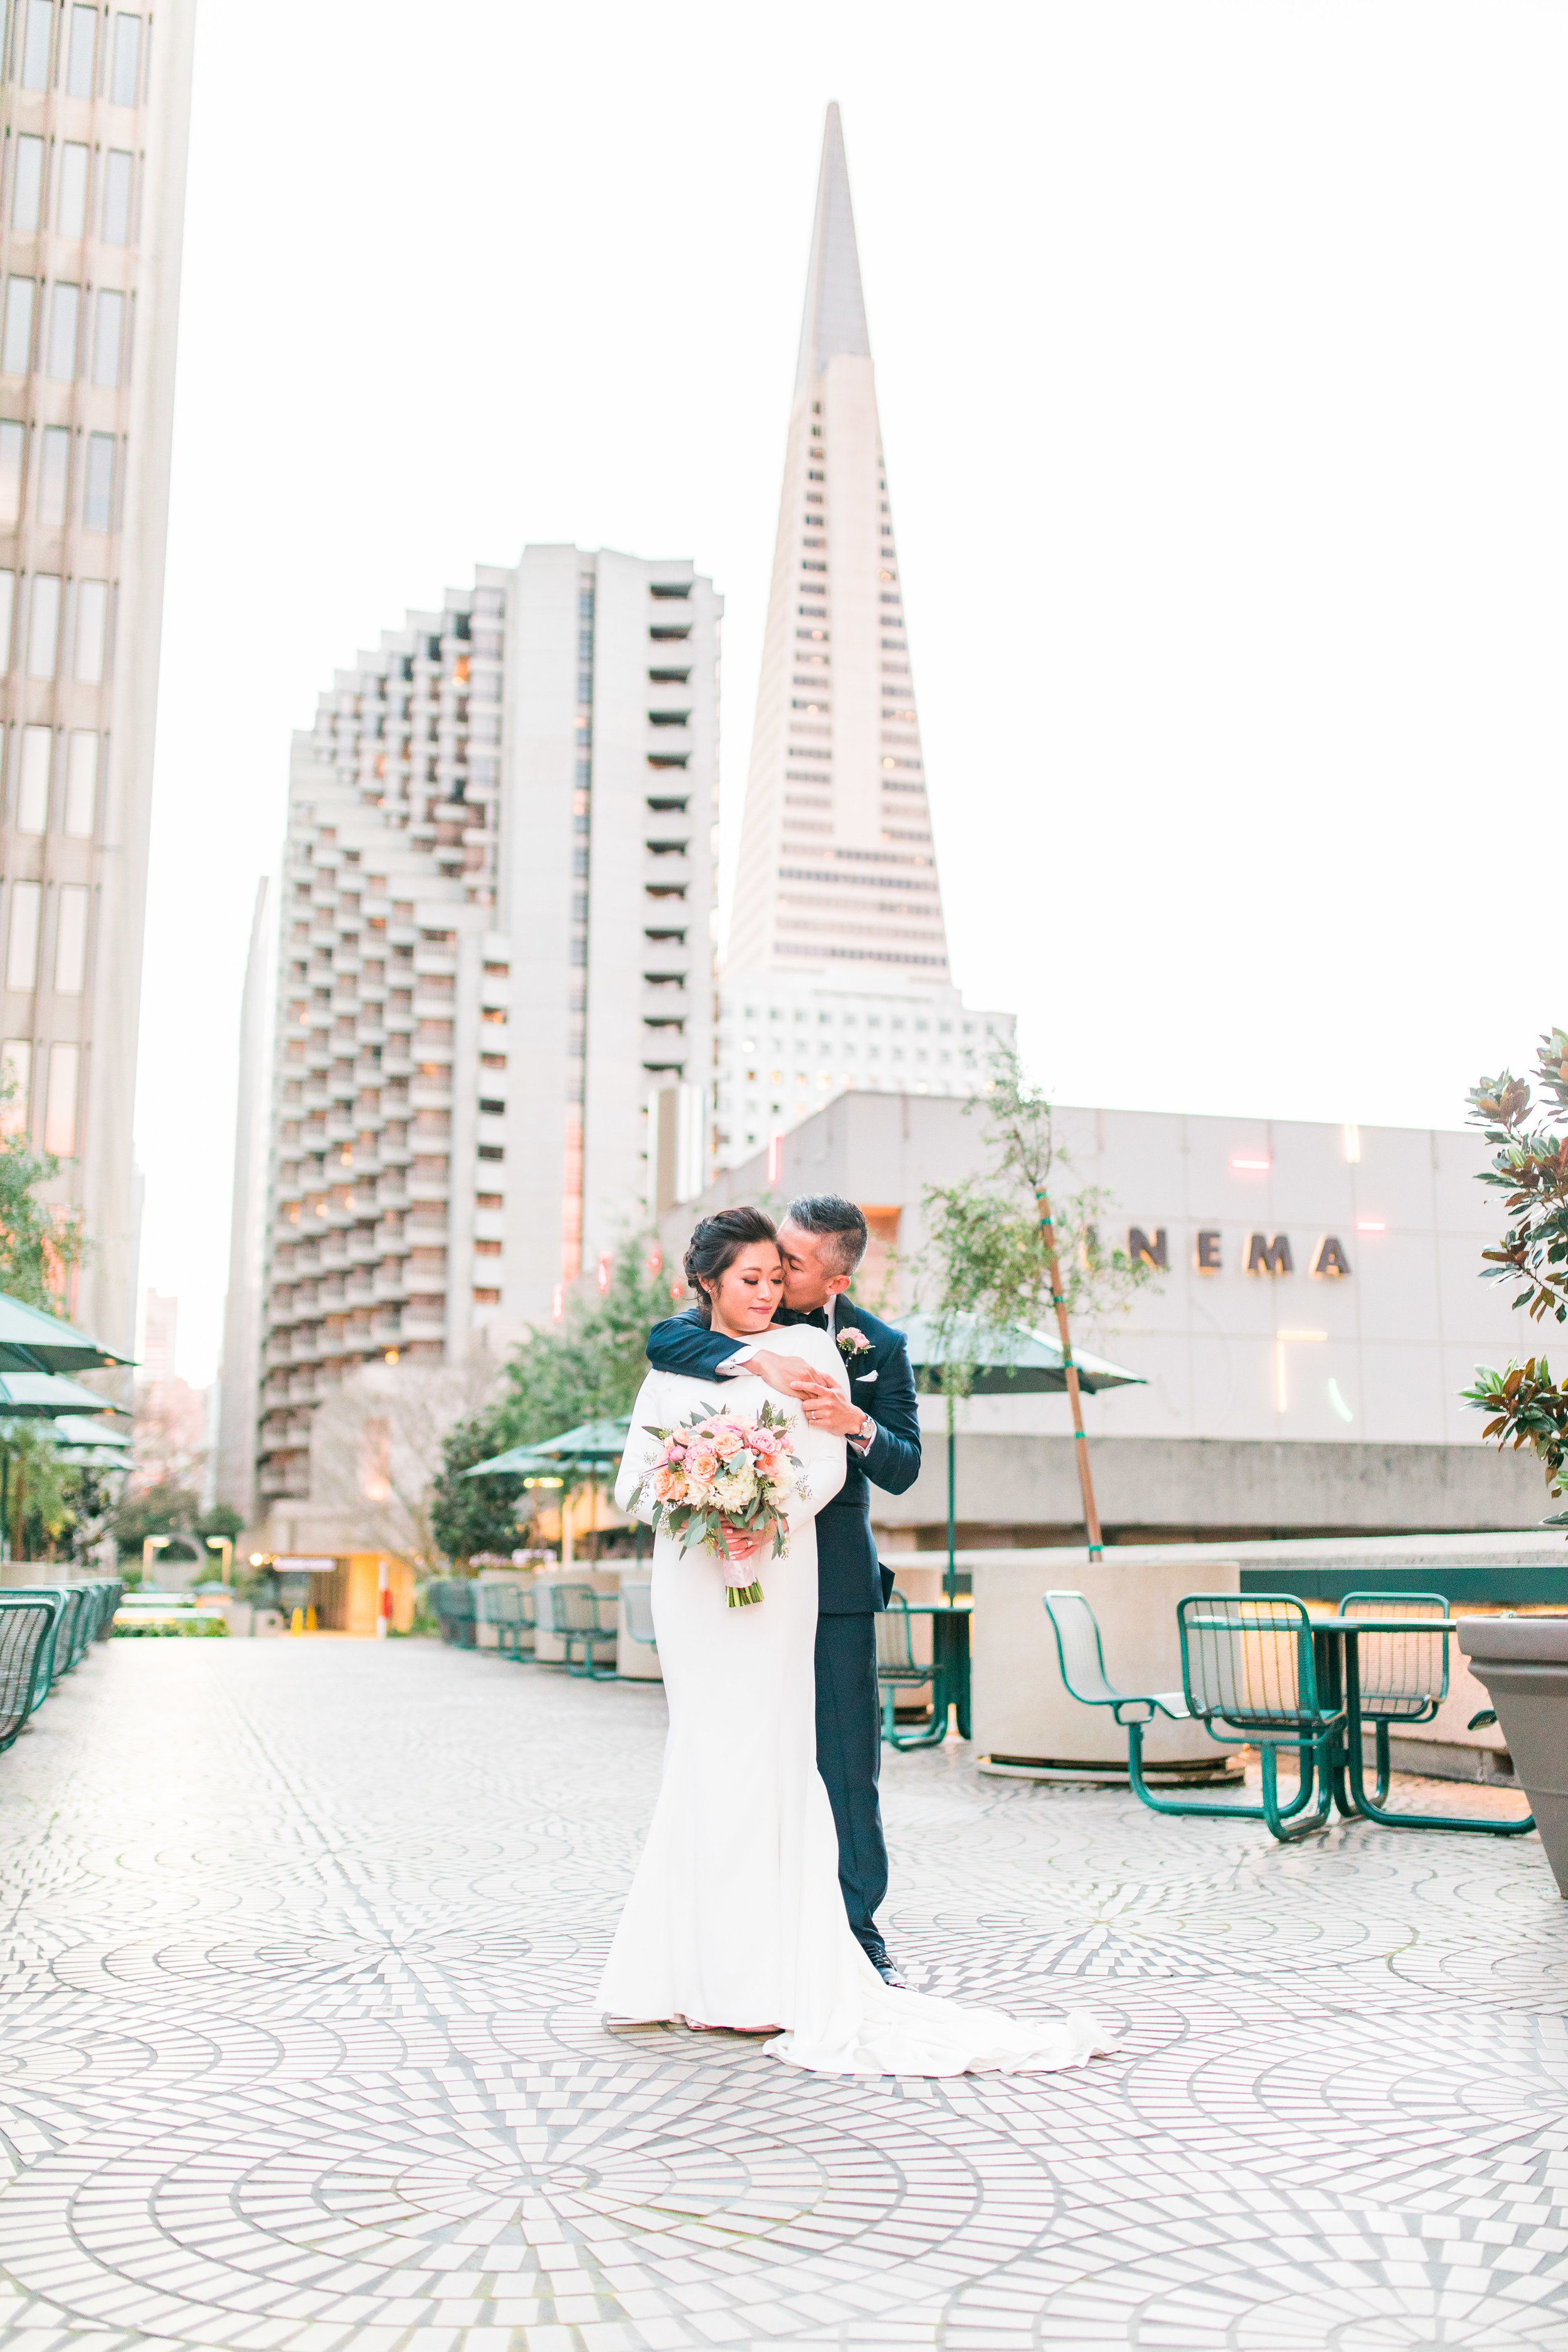 Marina-Eugene-Wedding-by-JBJ-Pictures-293.jpg